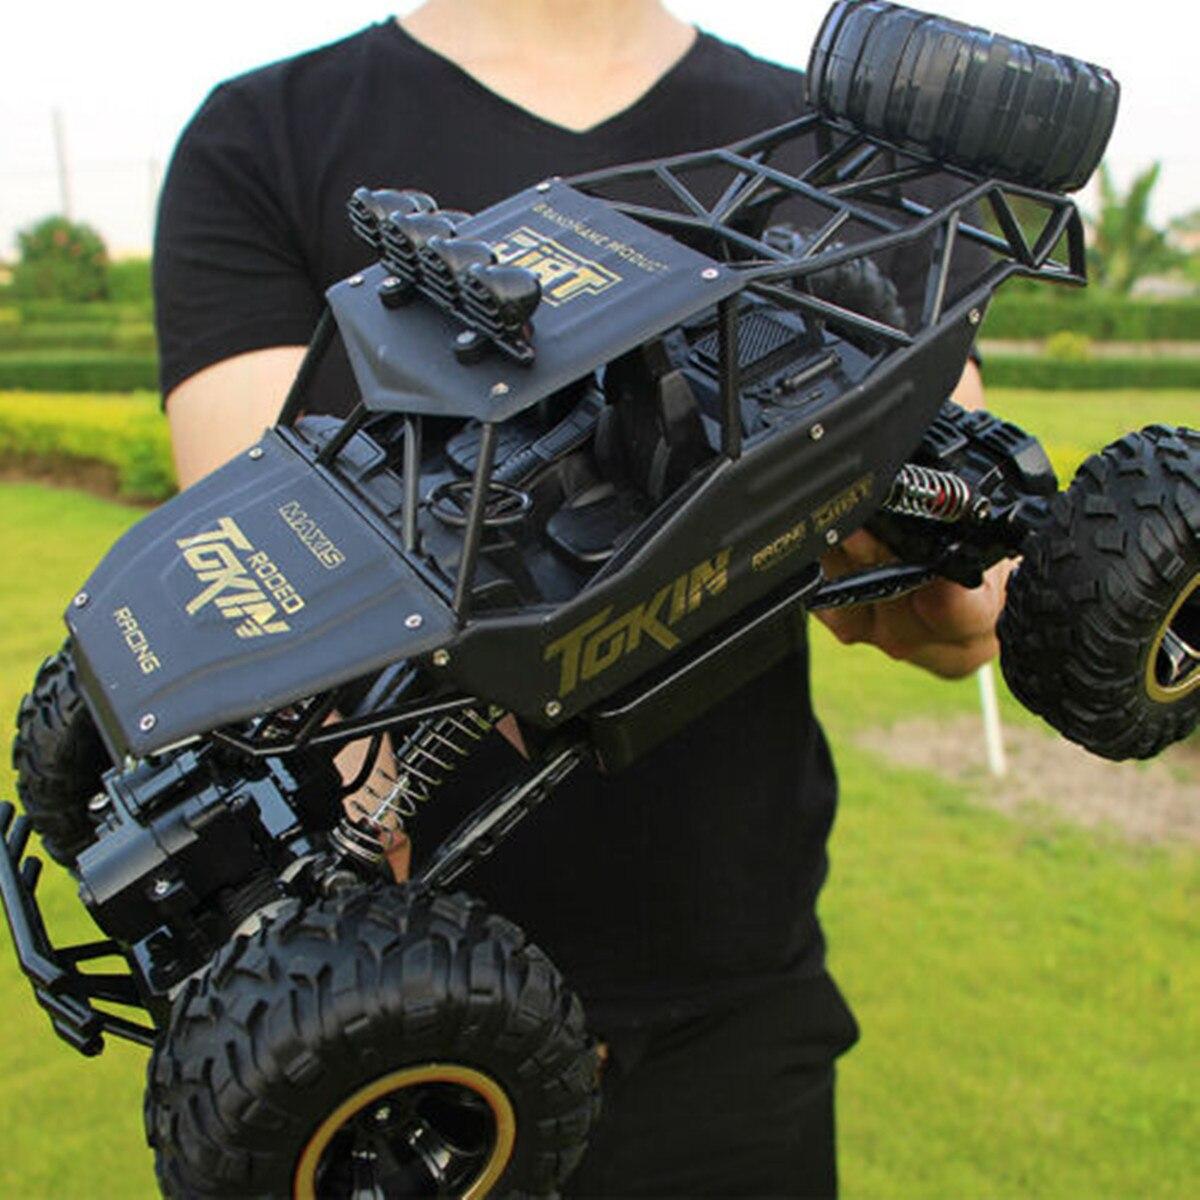 1:12 37cm / 1:16 28cm 4WD RC Car 2.4G Radio Remote Control Car Toys High speed Trucks Off-Road Trucks Toys Gift for Children